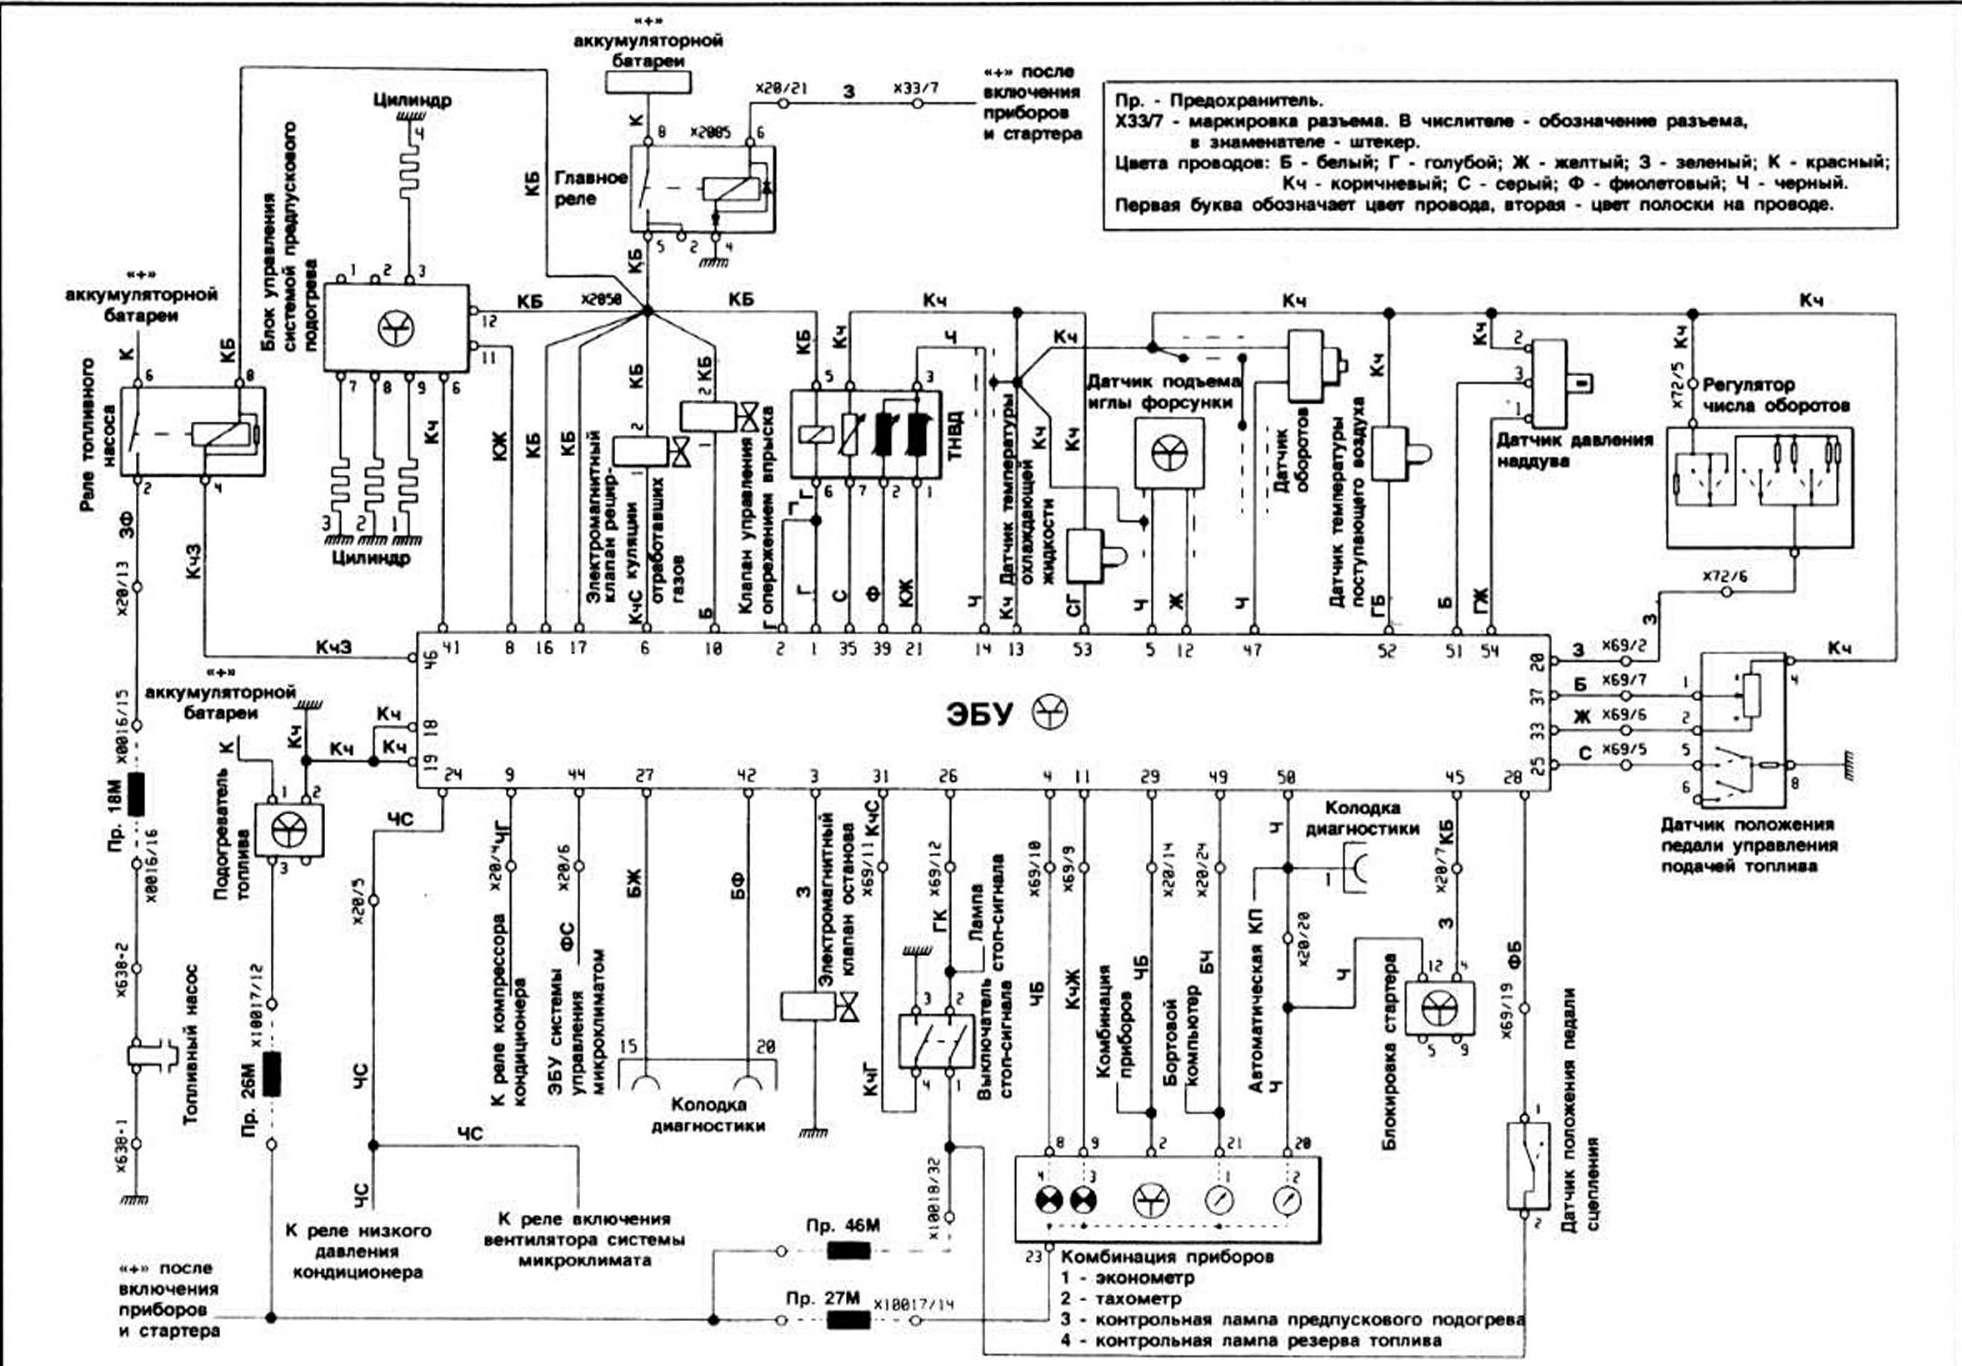 електрическая схема на бмв е 36